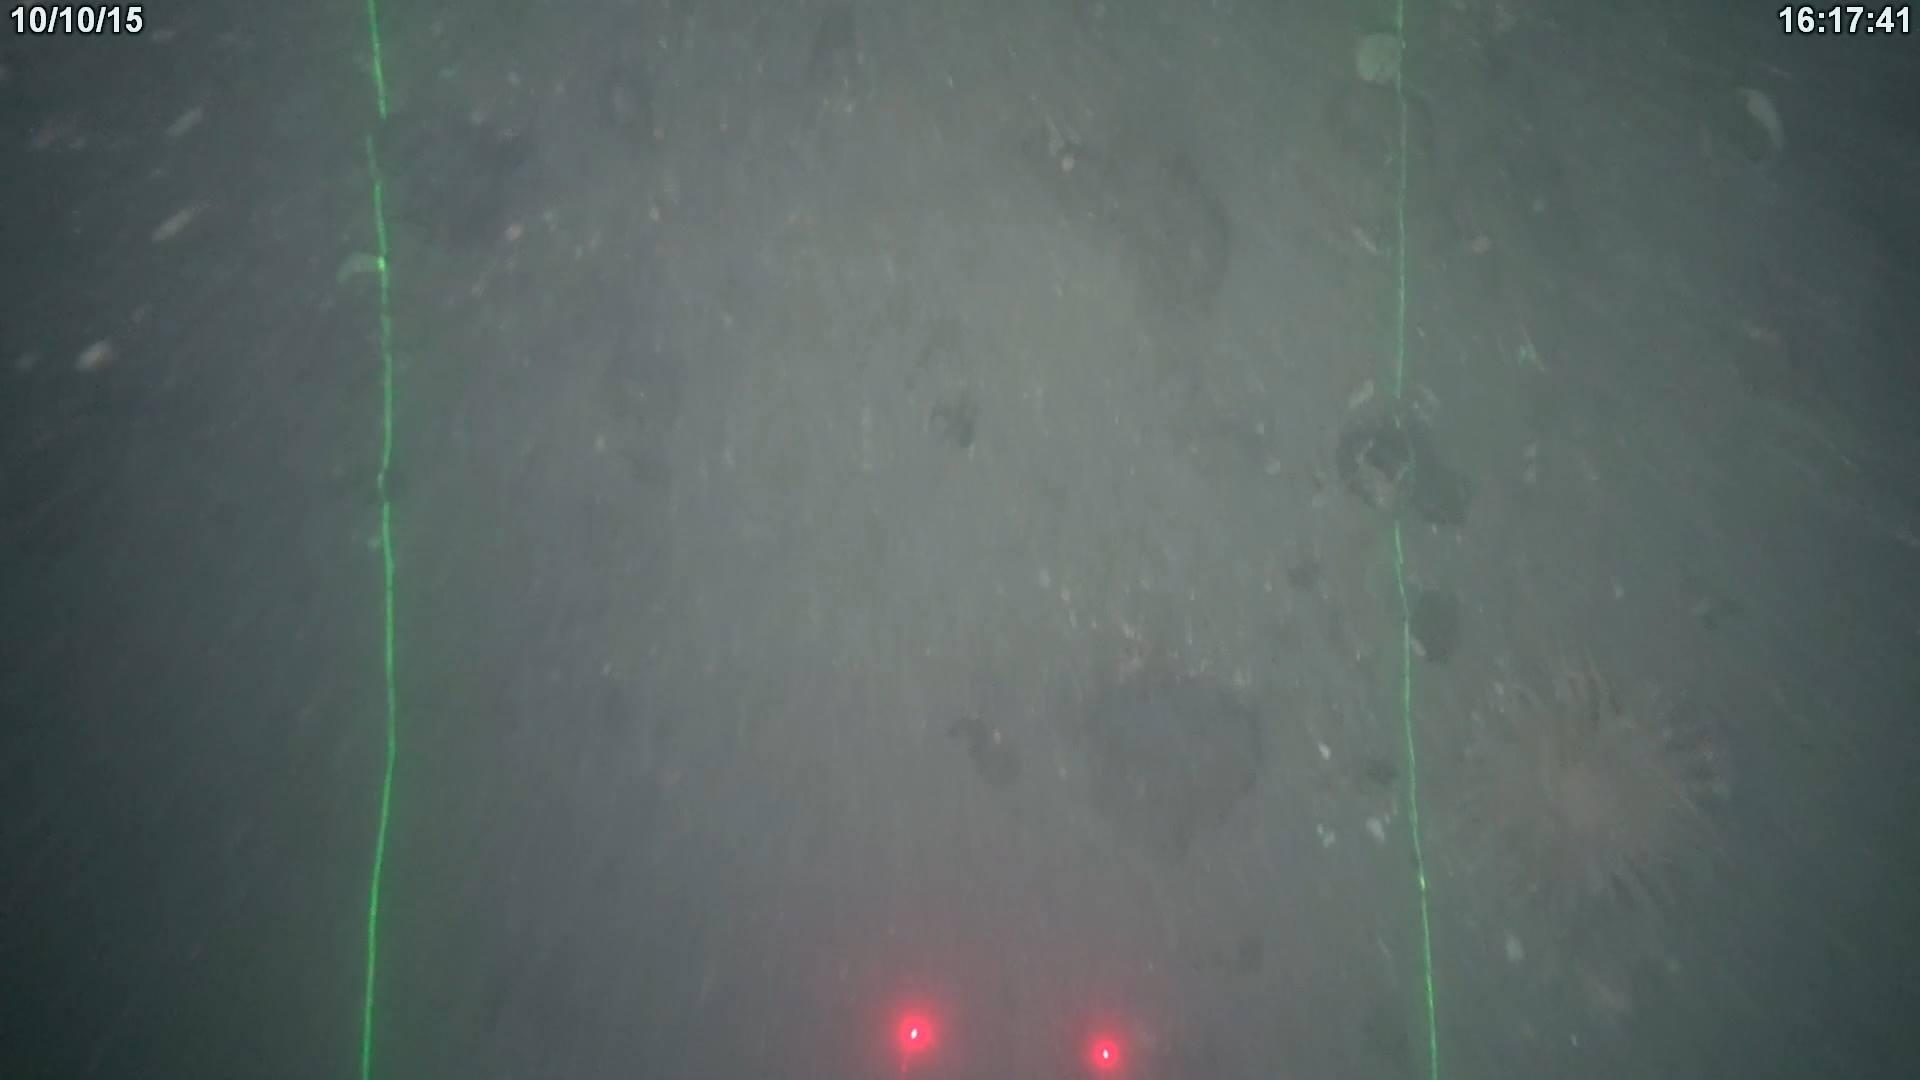 Savante Subsea Laser Modules during benthic survey